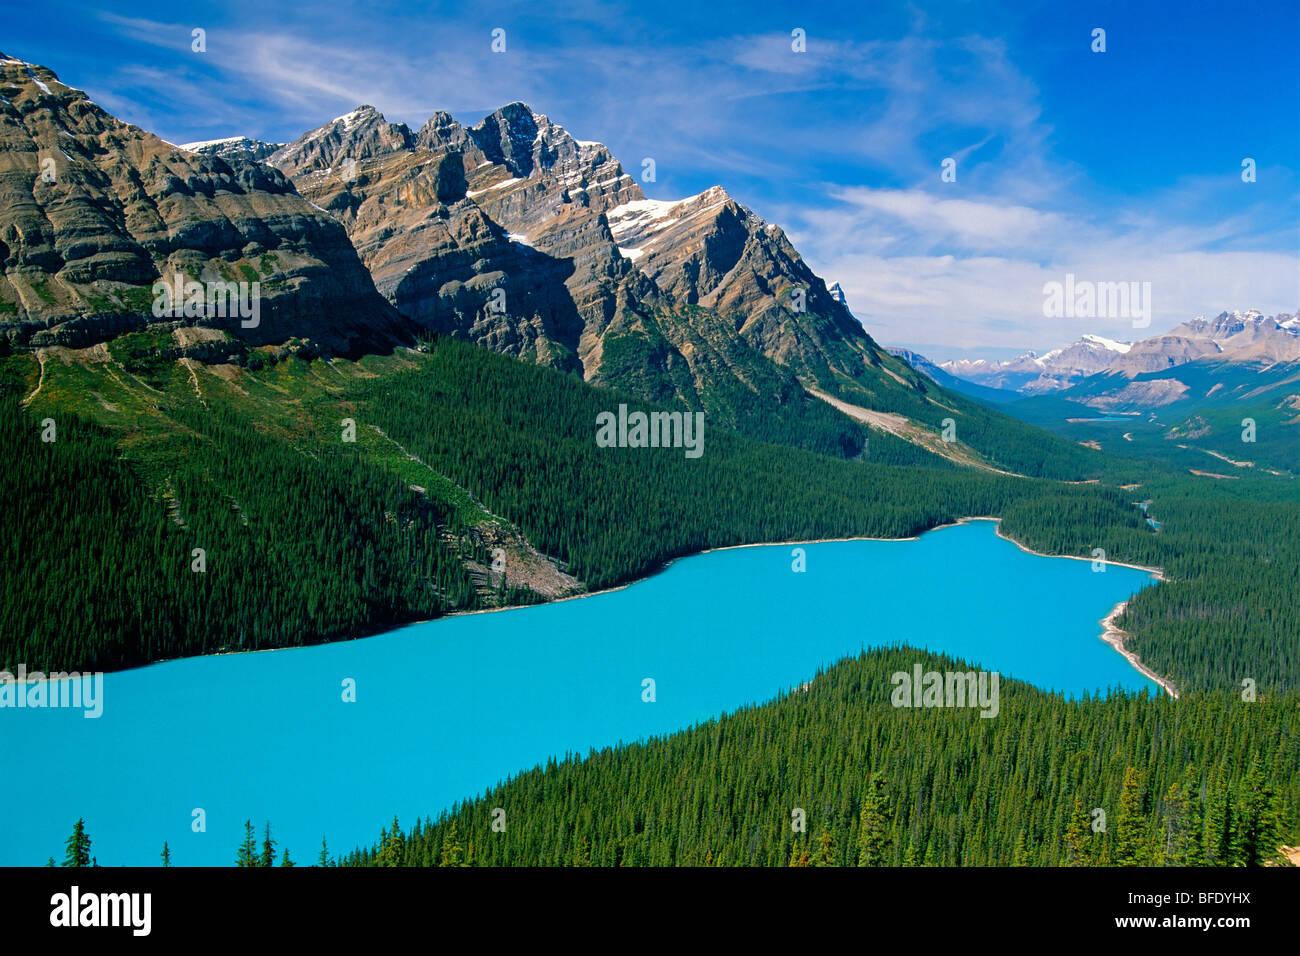 Portrait de Peyto Lake, promenade des Glaciers, Banff National Park, Alberta, Canada Photo Stock